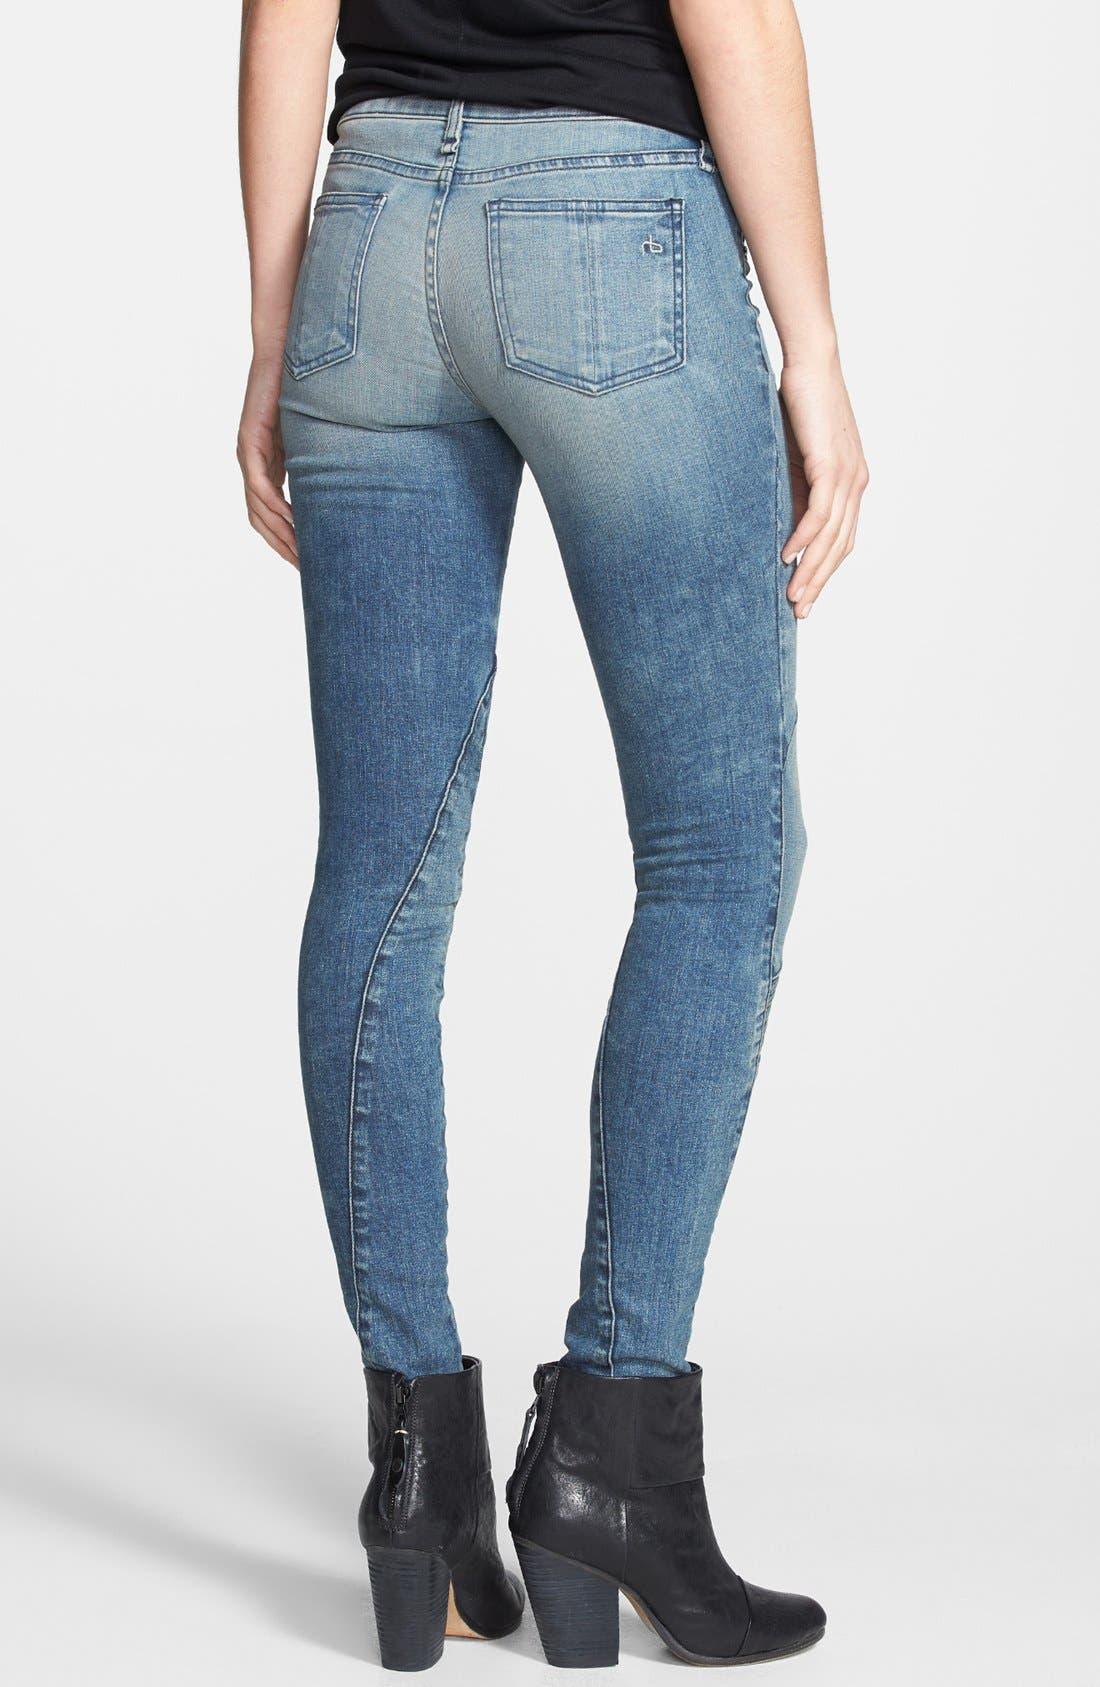 Alternate Image 2  - rag & bone/JEAN 'Samurai Legging' Skinny Jeans (Cardiff)